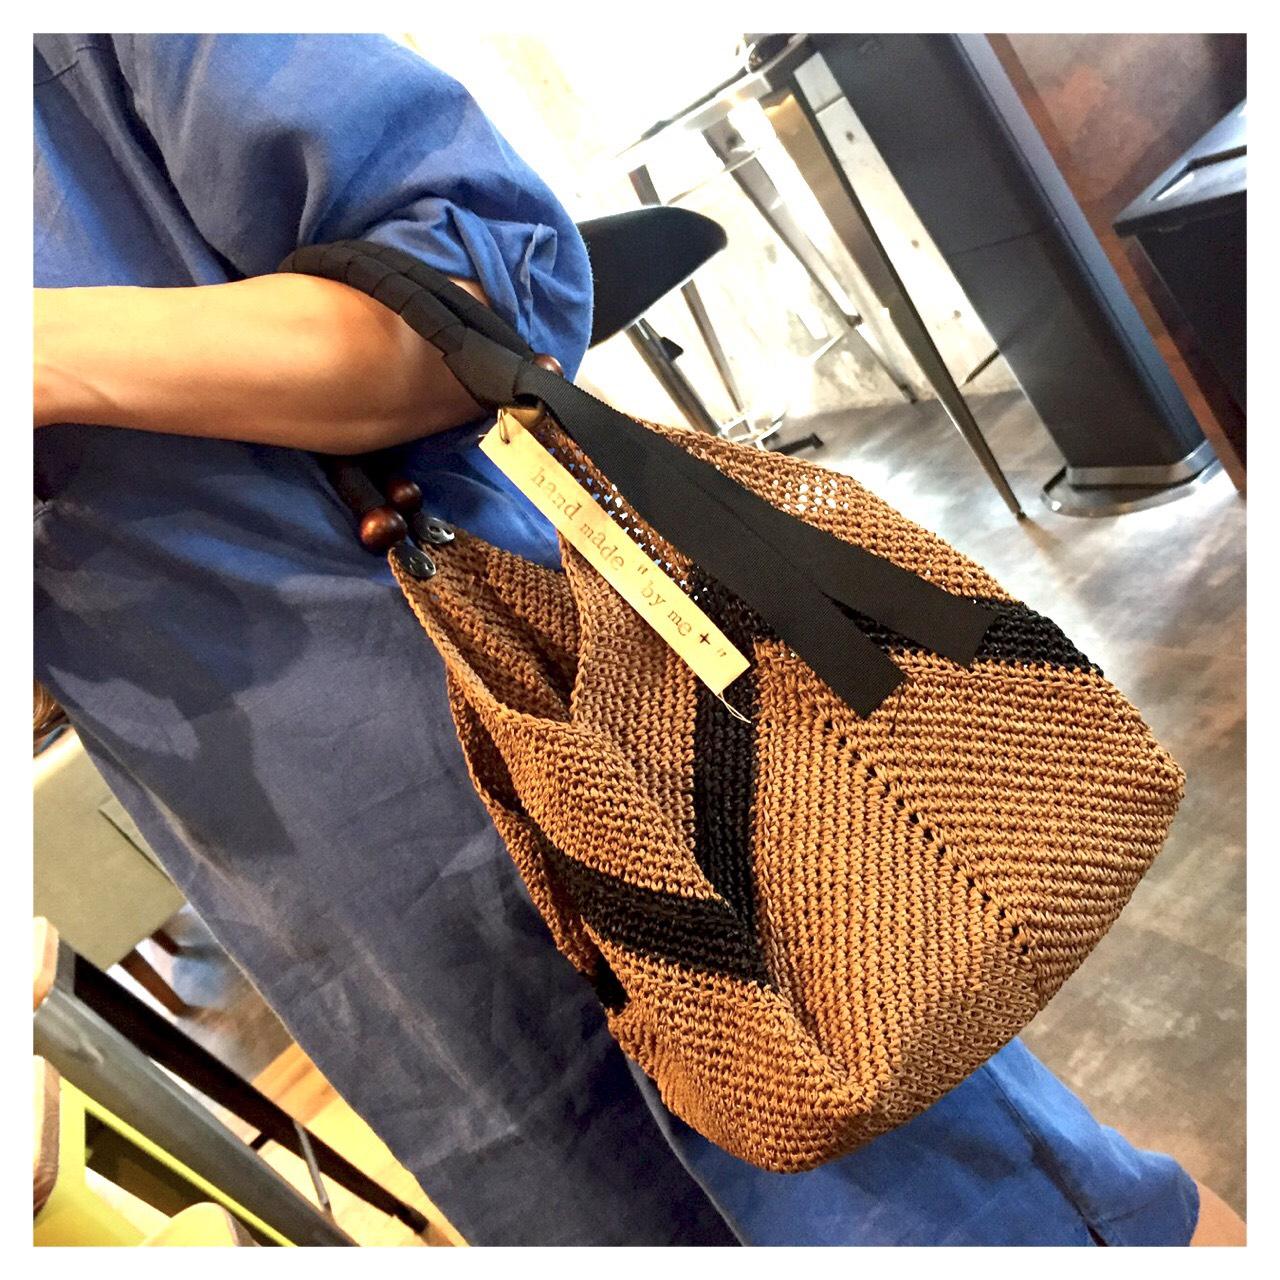 eriko's 作品集 夏の鞄のサムネイル